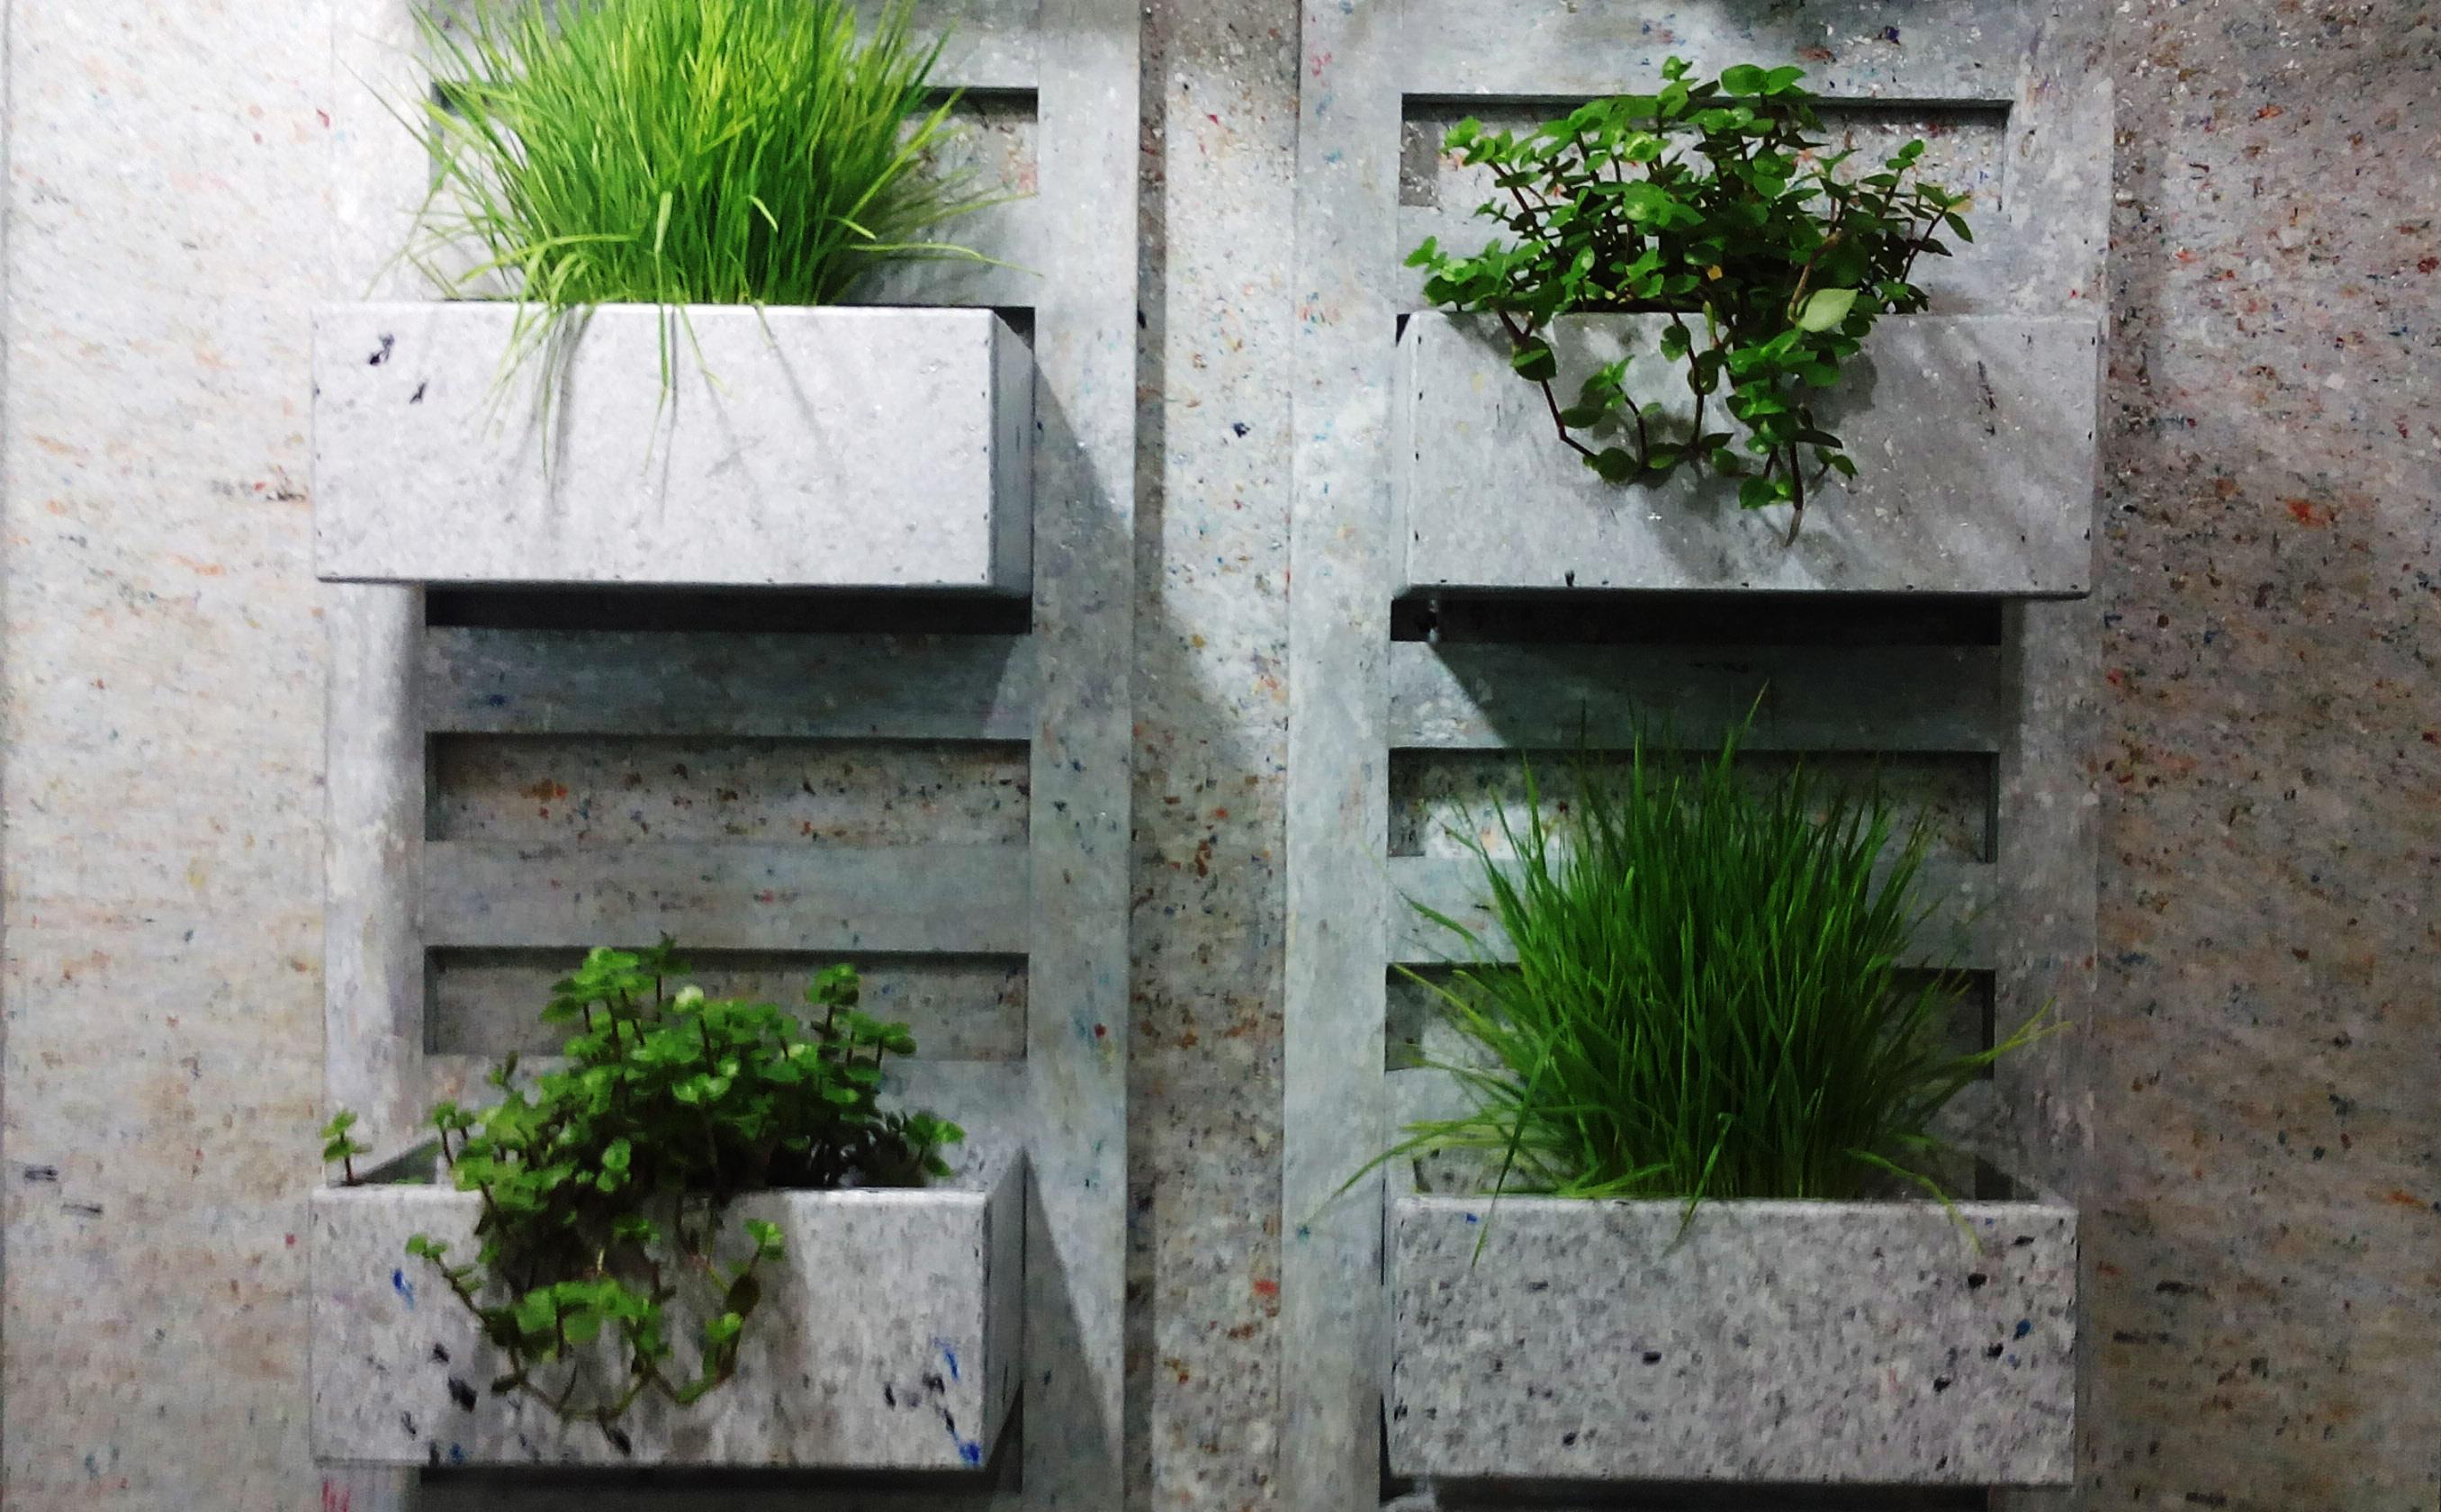 Vasos de plantas fabricados a partir de tubos de creme dental, acoplados na parede